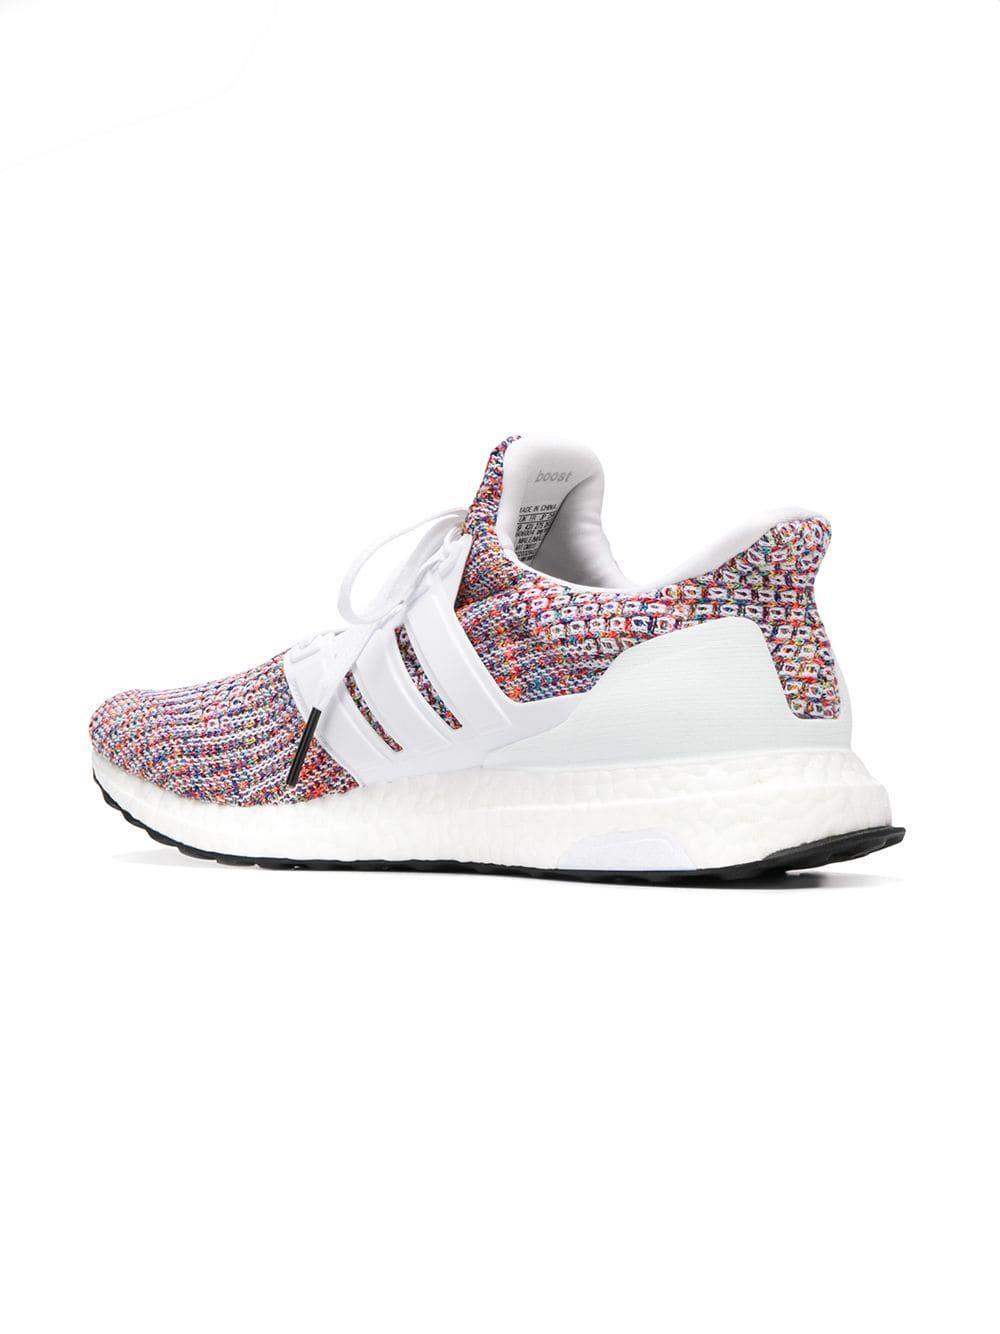 6560daa2da2d6c Adidas - White Ultra Boost 4.0 Sneakers for Men - Lyst. View fullscreen